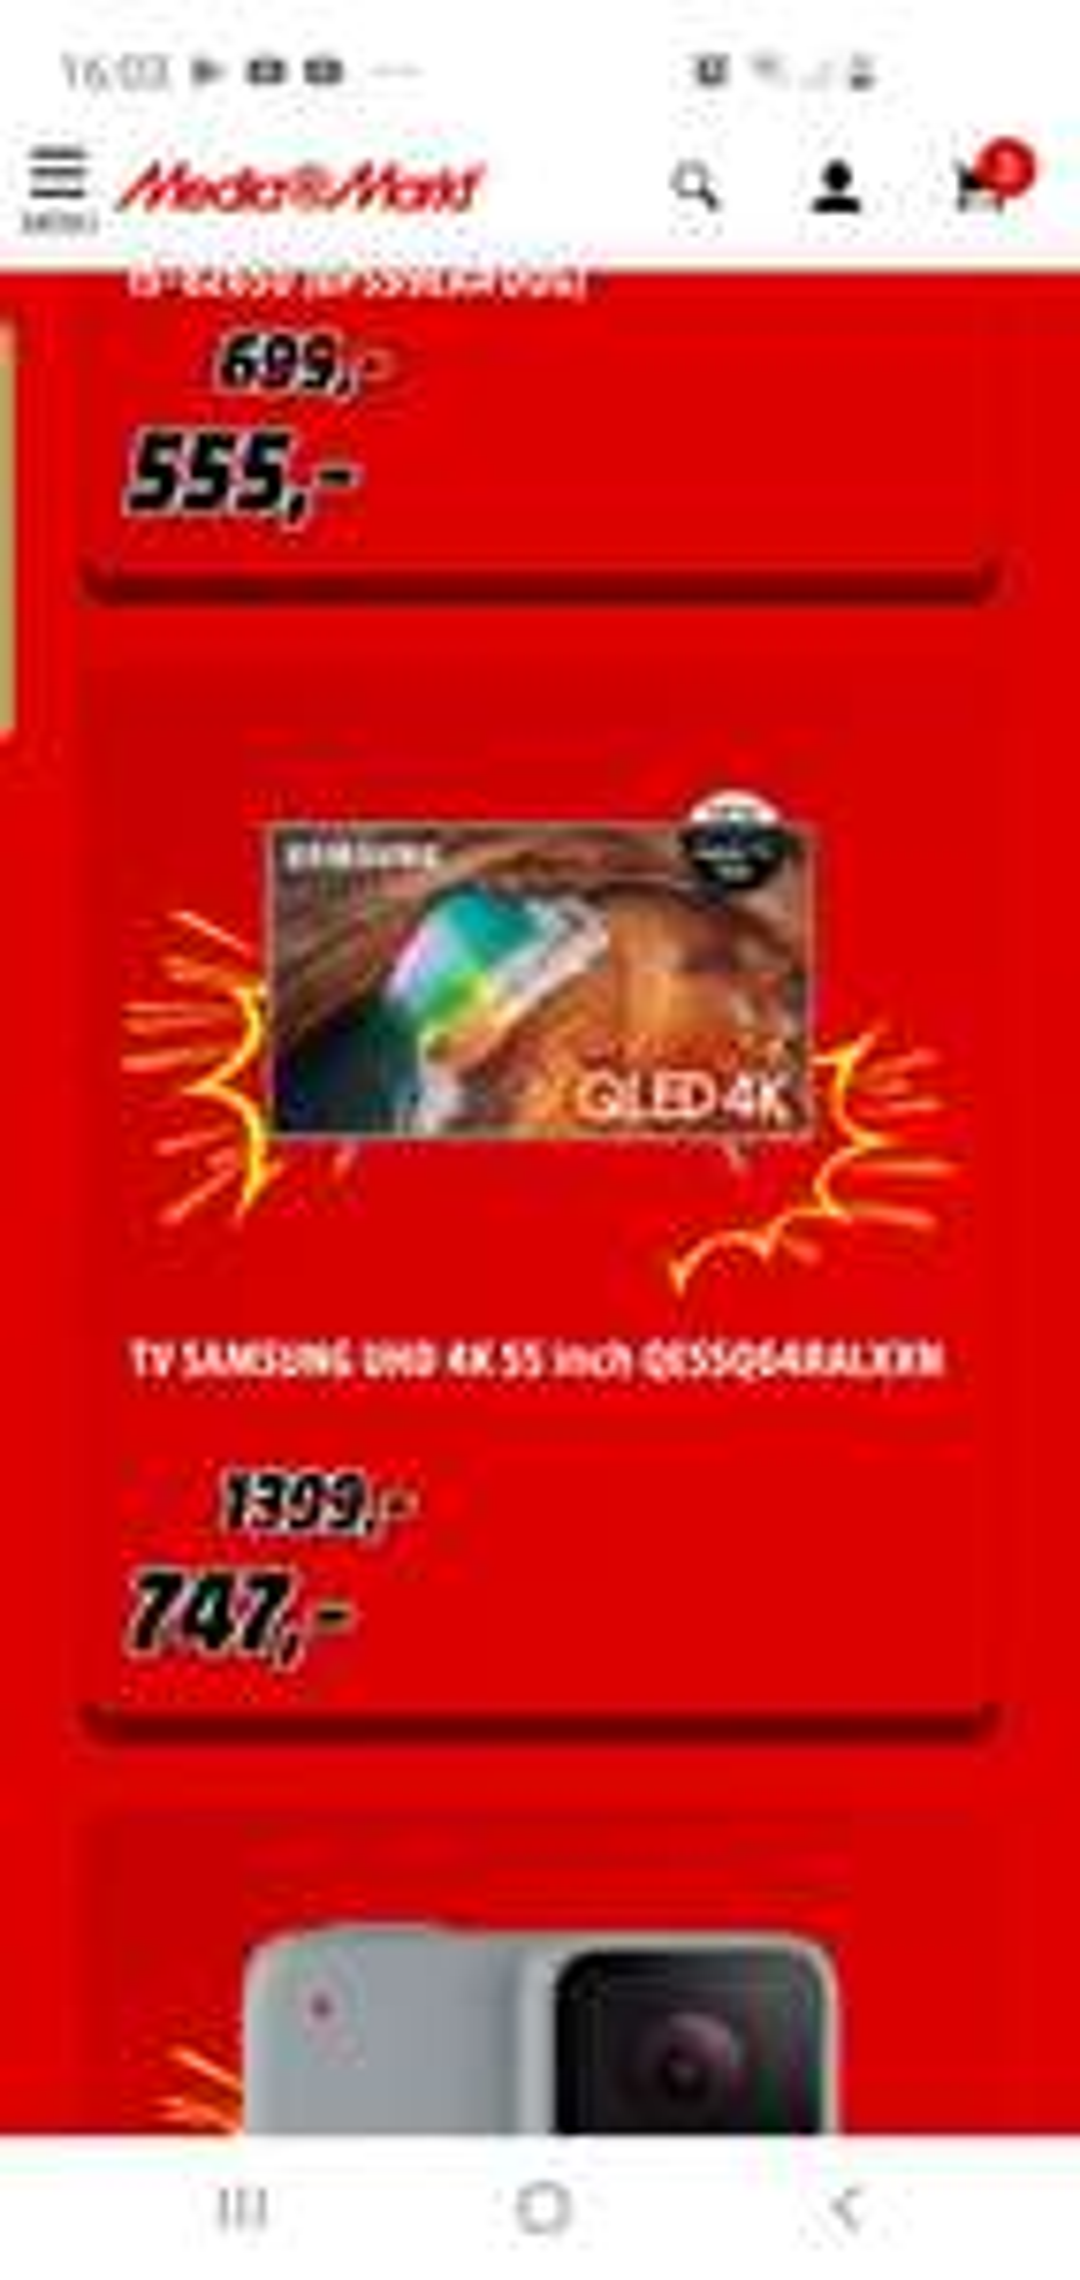 Grensdeal belgie TV SAMSUNG UHD 4K 55 inch QE55Q64RALXXN